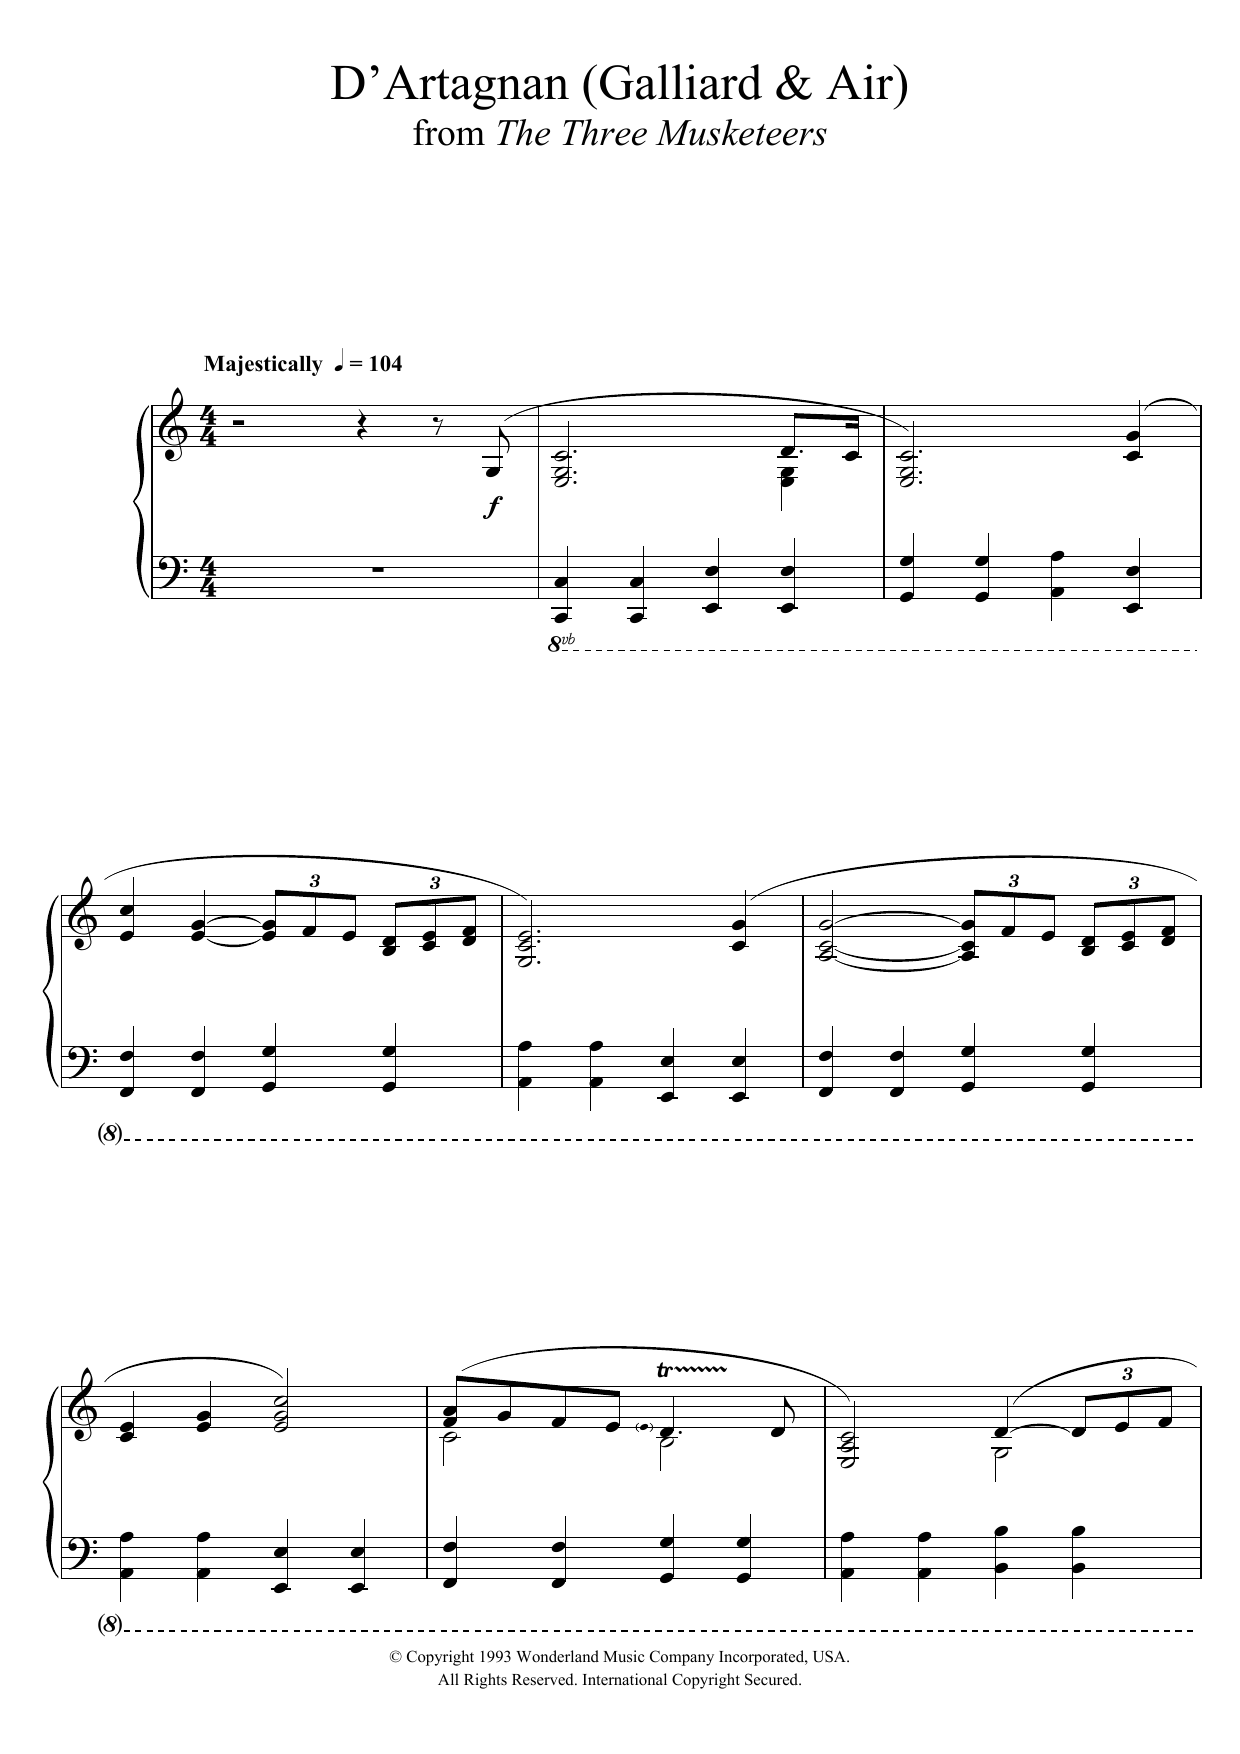 Michael Kamen The Three Musketeers (D'Artagnan (Galliard & Air)) sheet music notes and chords. Download Printable PDF.